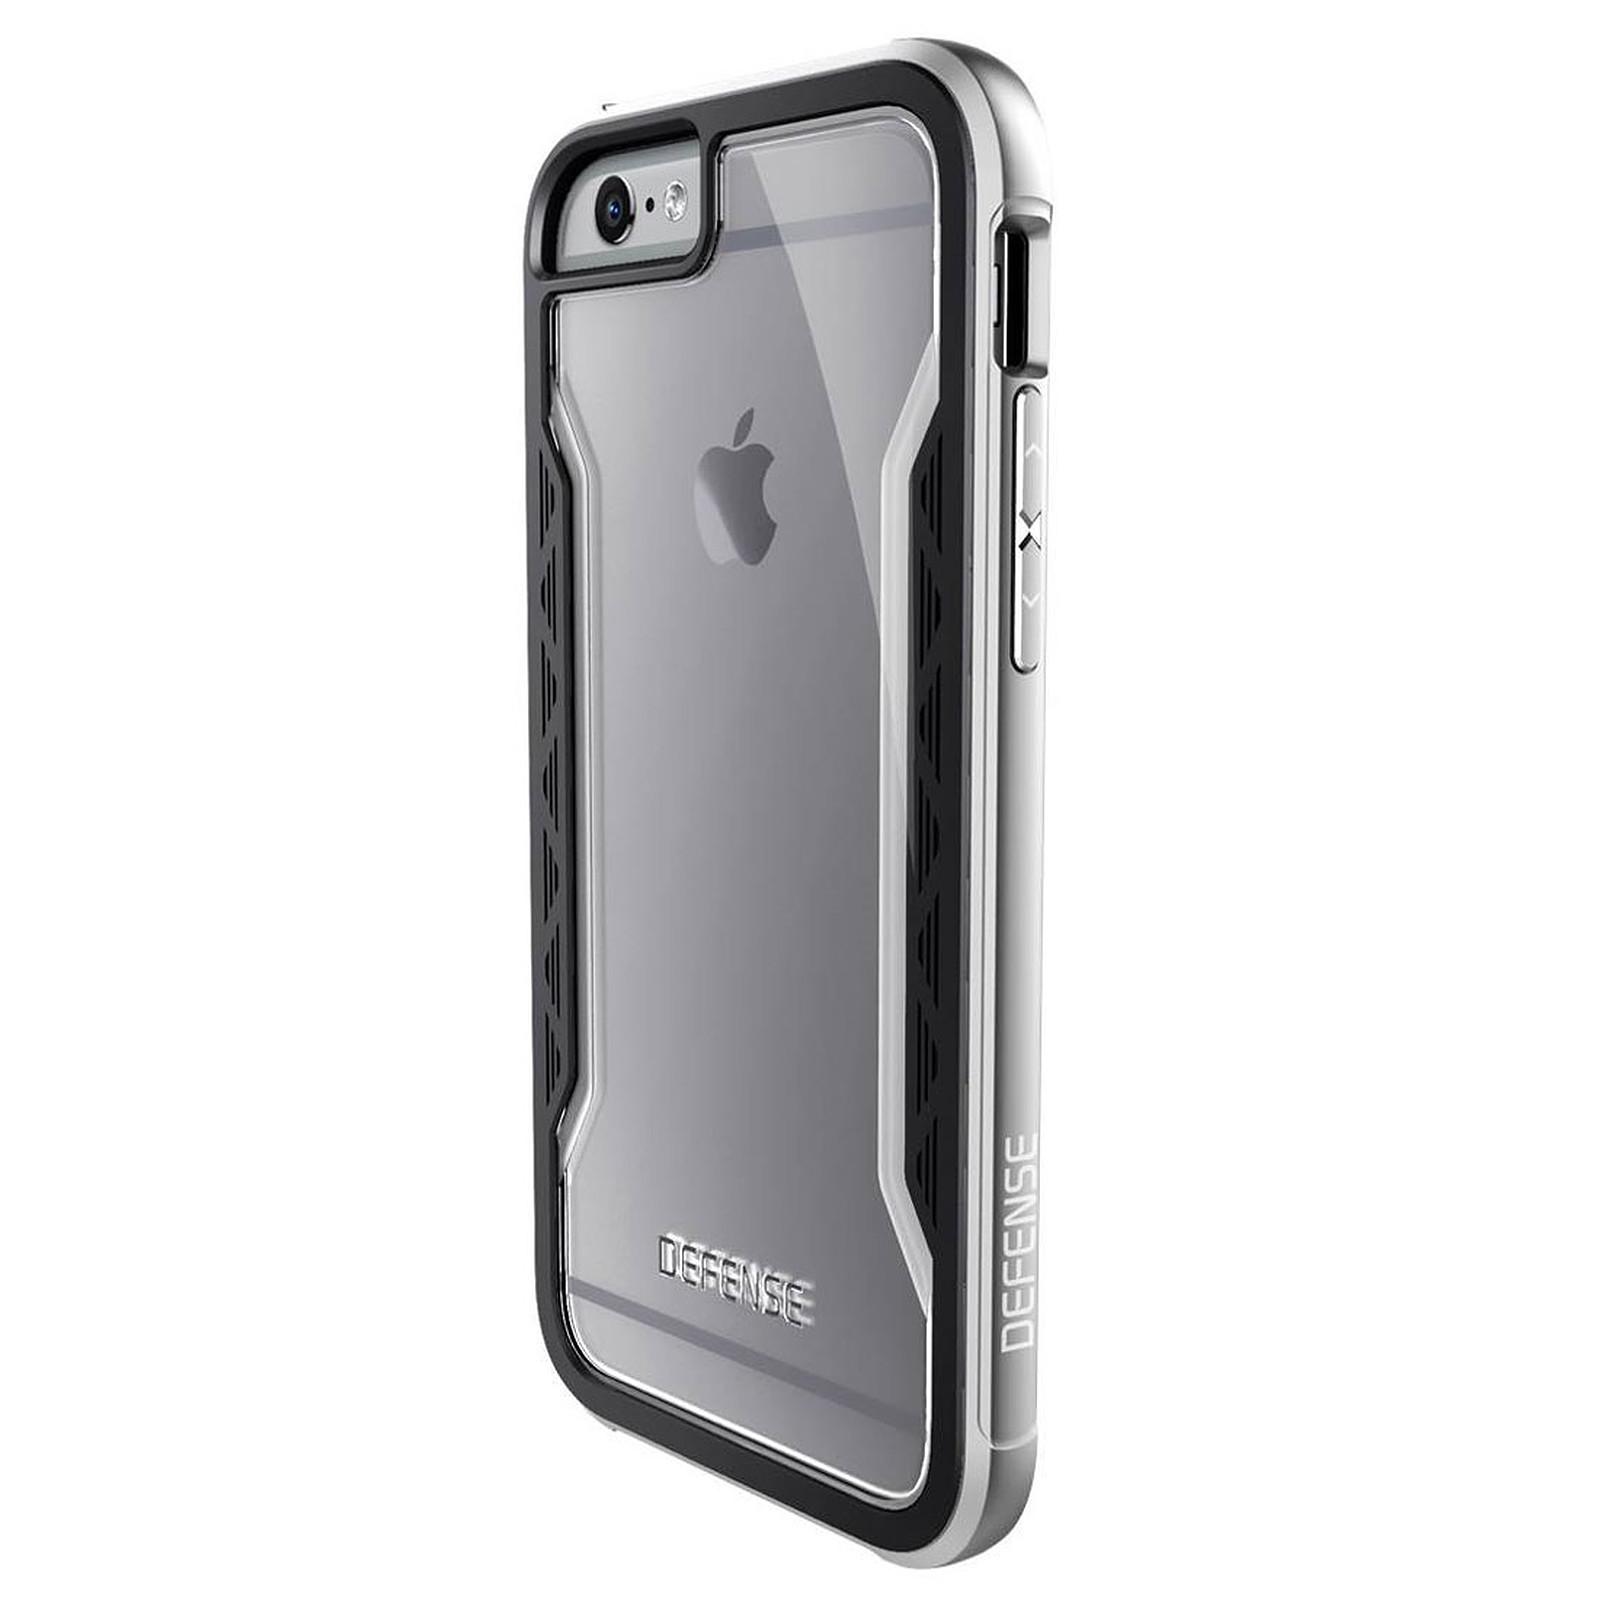 X-Doria Coque de protection defense shield argent iPhone 6